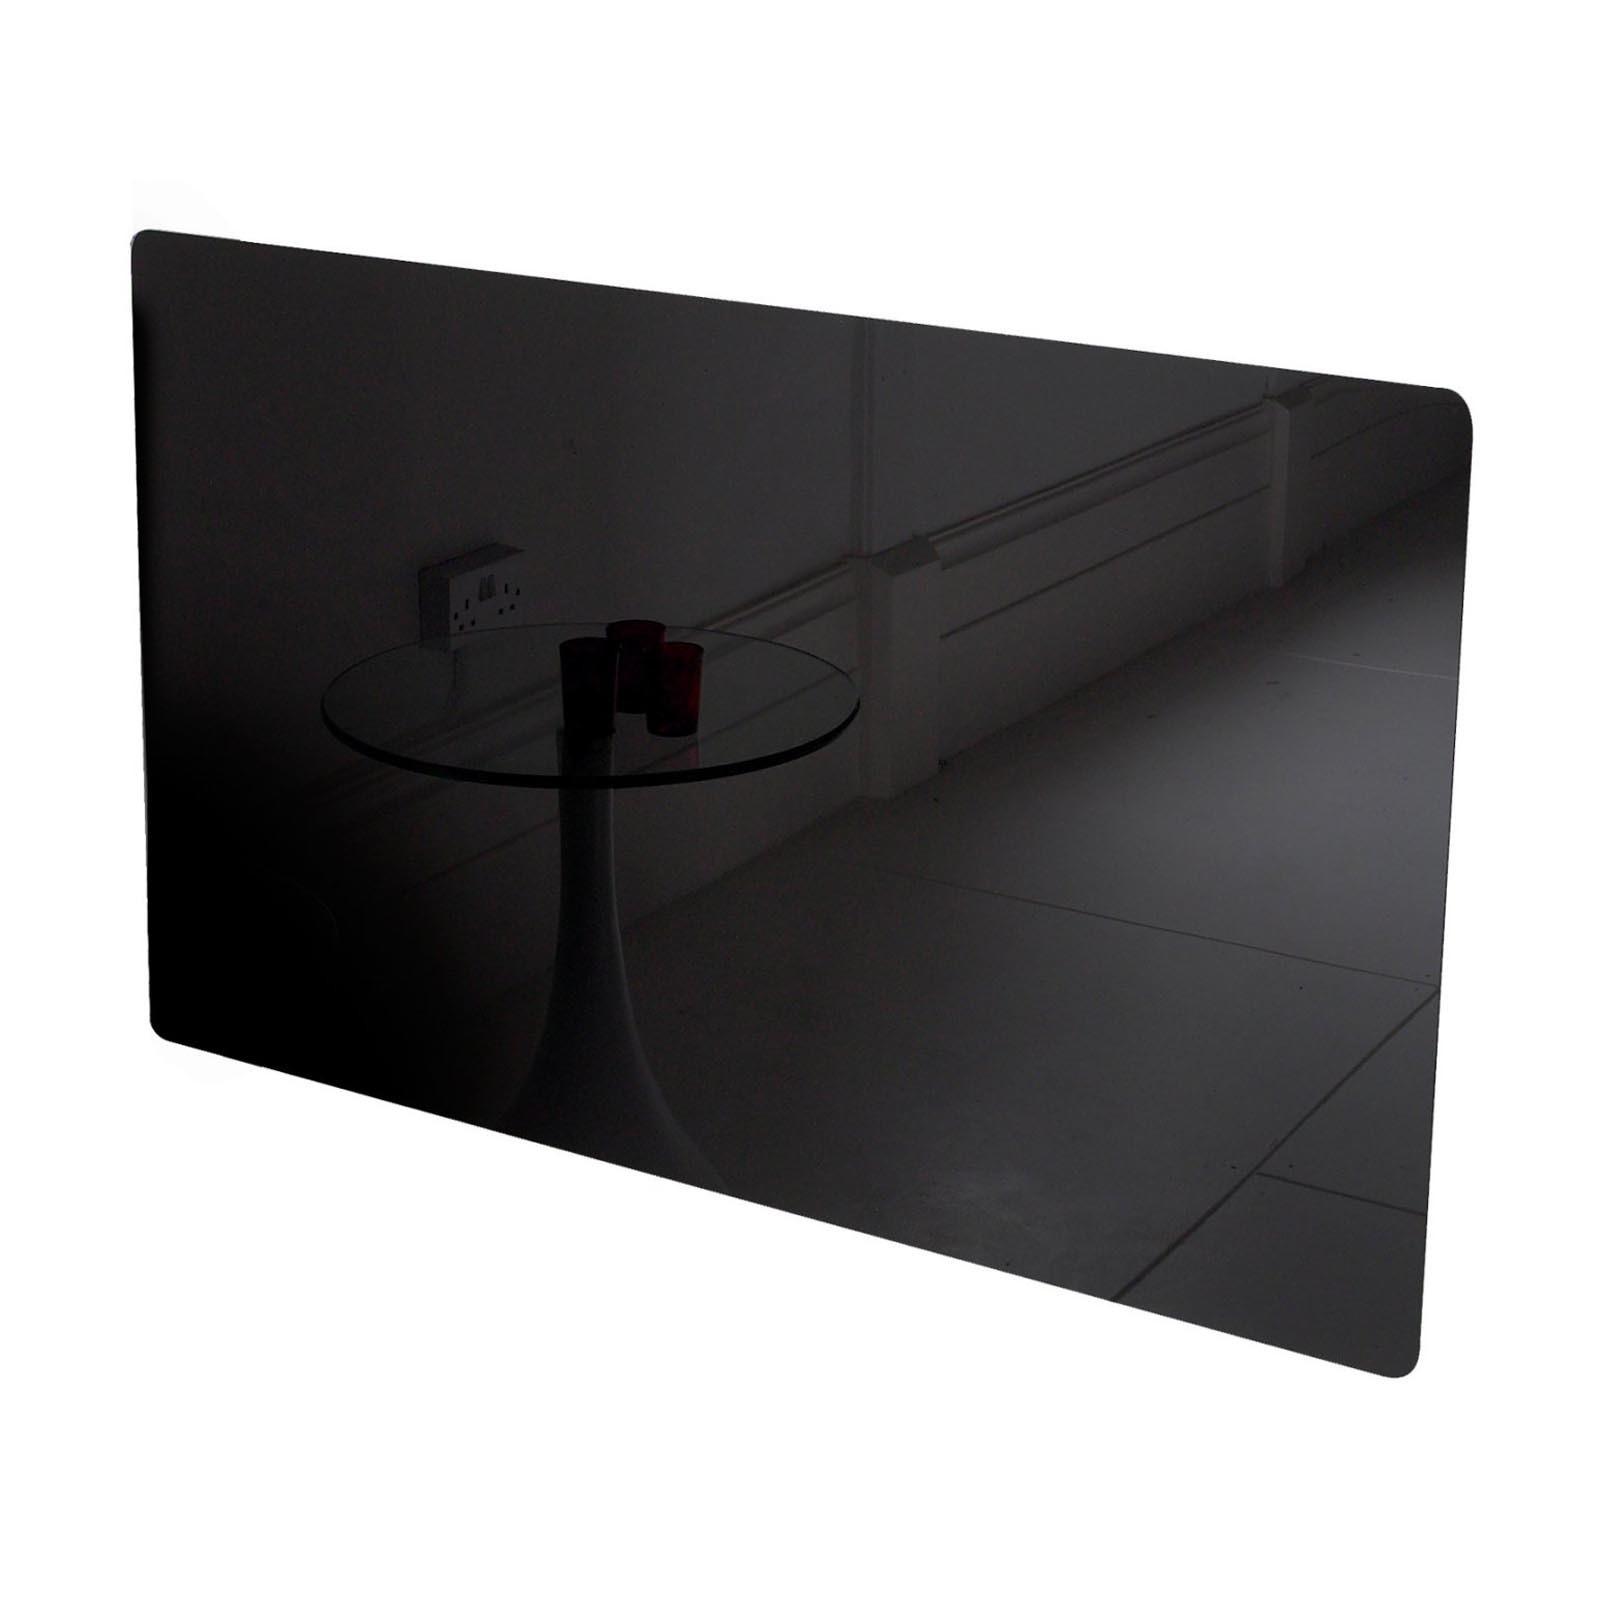 adam vitreo small black glass radiator cover - Black Glass